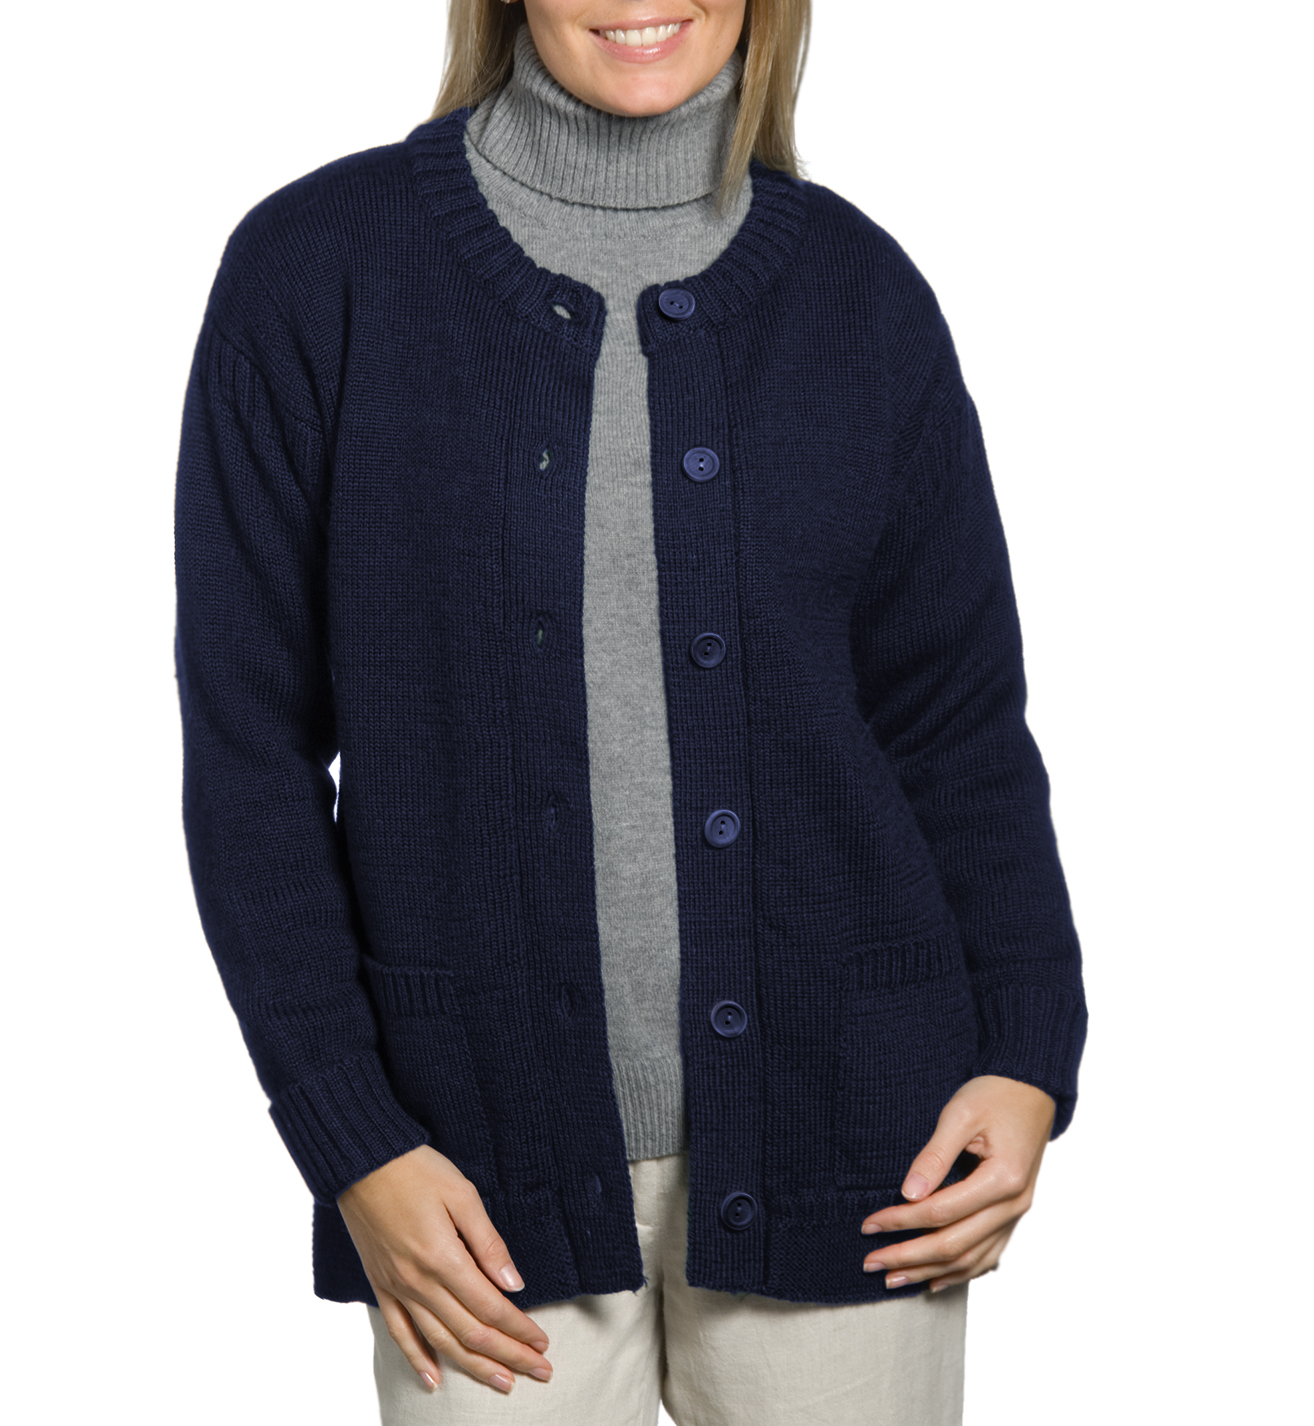 woolovers damen guernsey strickjacke rundhals langarm cardigan wolle pullover ebay. Black Bedroom Furniture Sets. Home Design Ideas